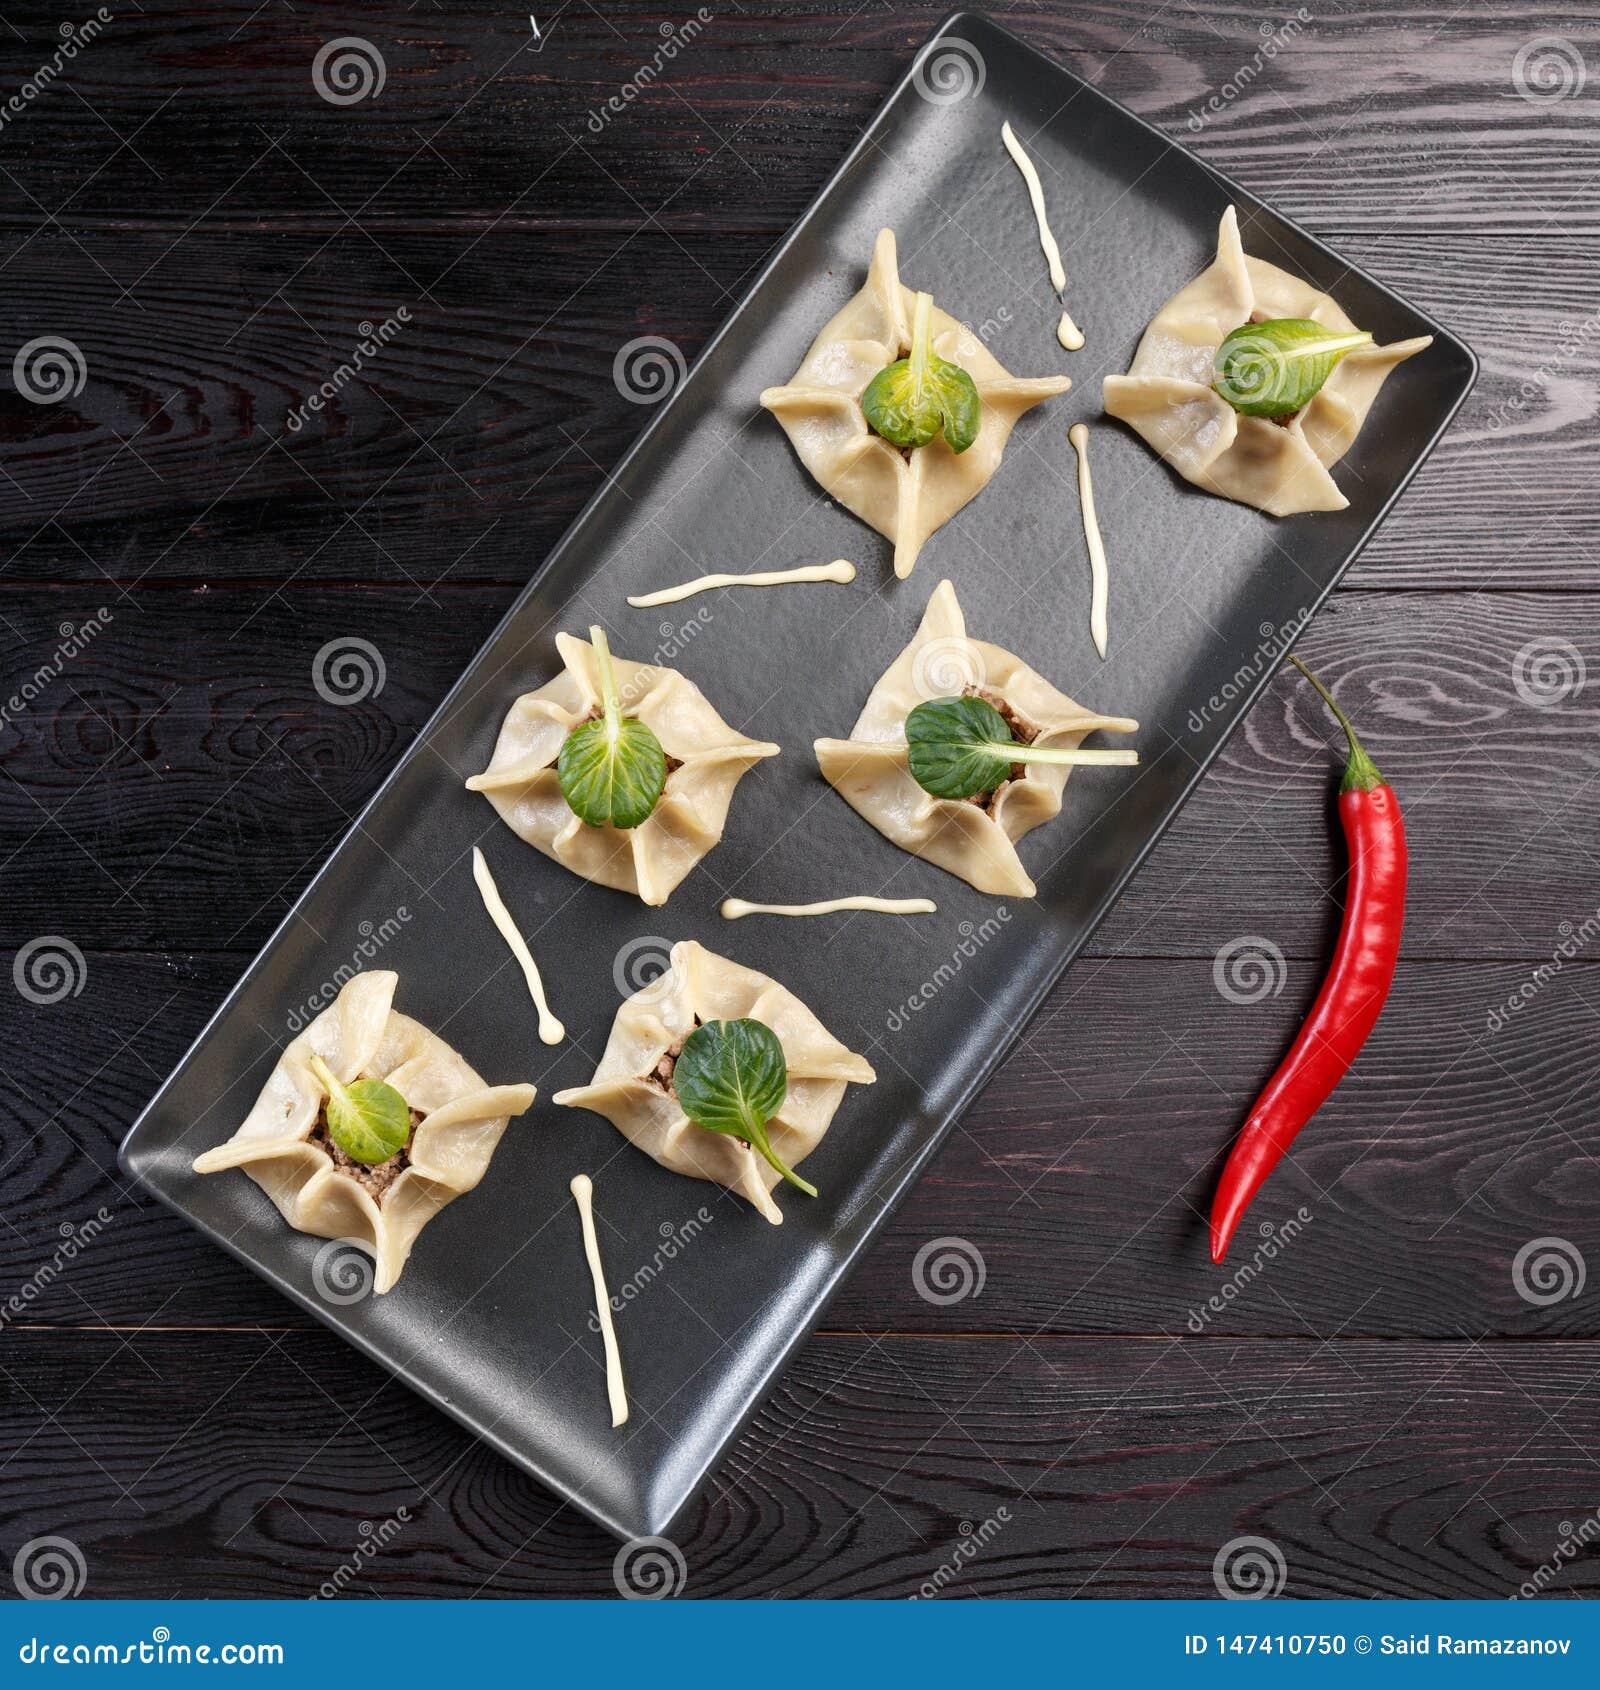 Gyoza με το σπανάκι, το ricotta και το αρνί σε ένα μαύρο πιάτο σε ένα σκοτεινό ξύλινο υπόβαθρο